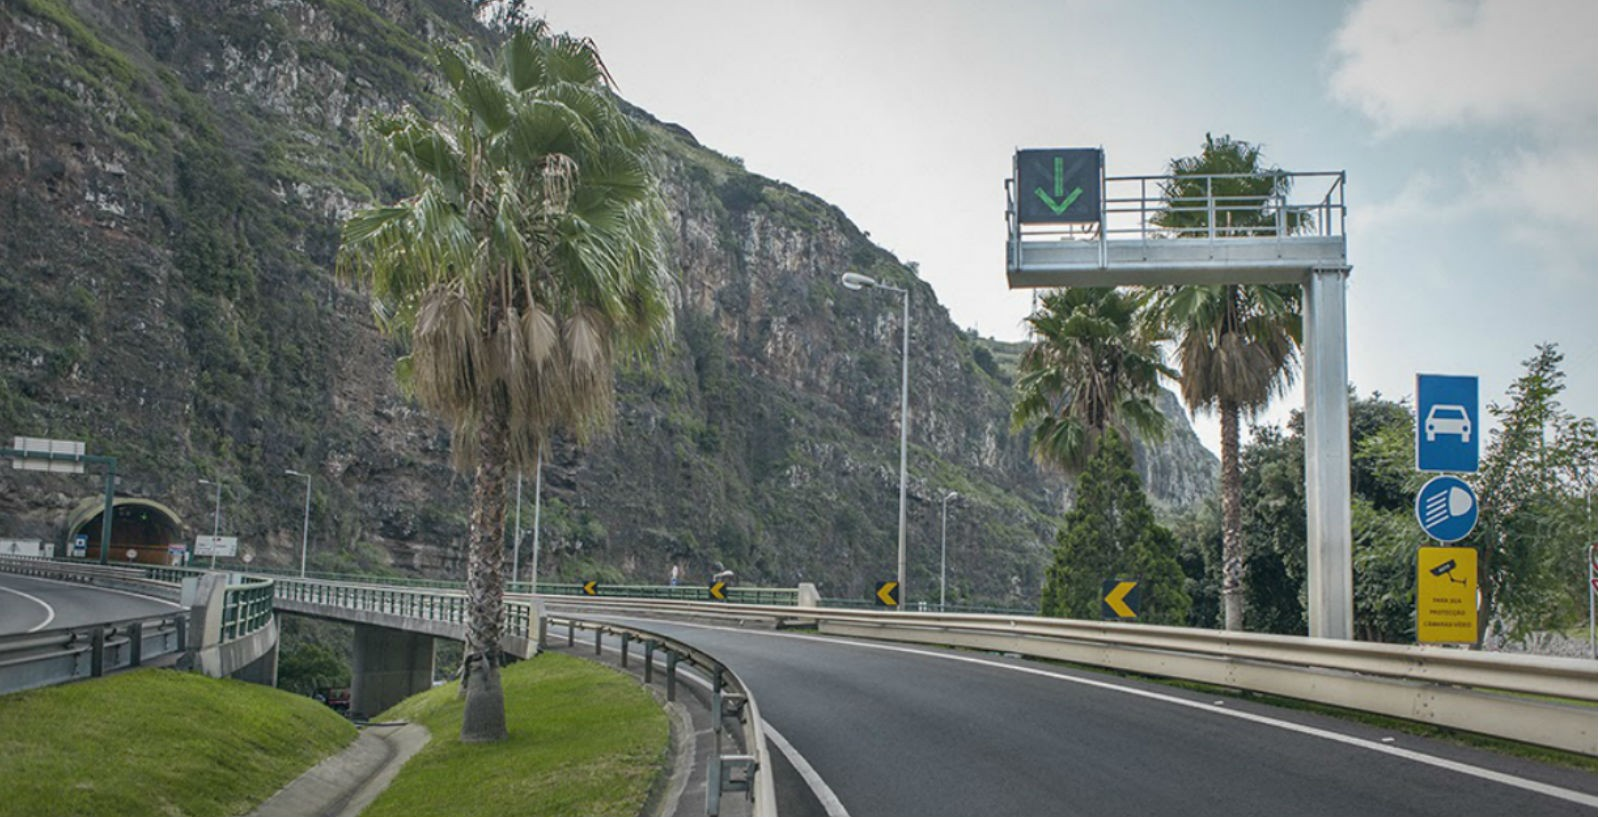 Vialitoral_ITS_Tunel_Madeira_Idom_4